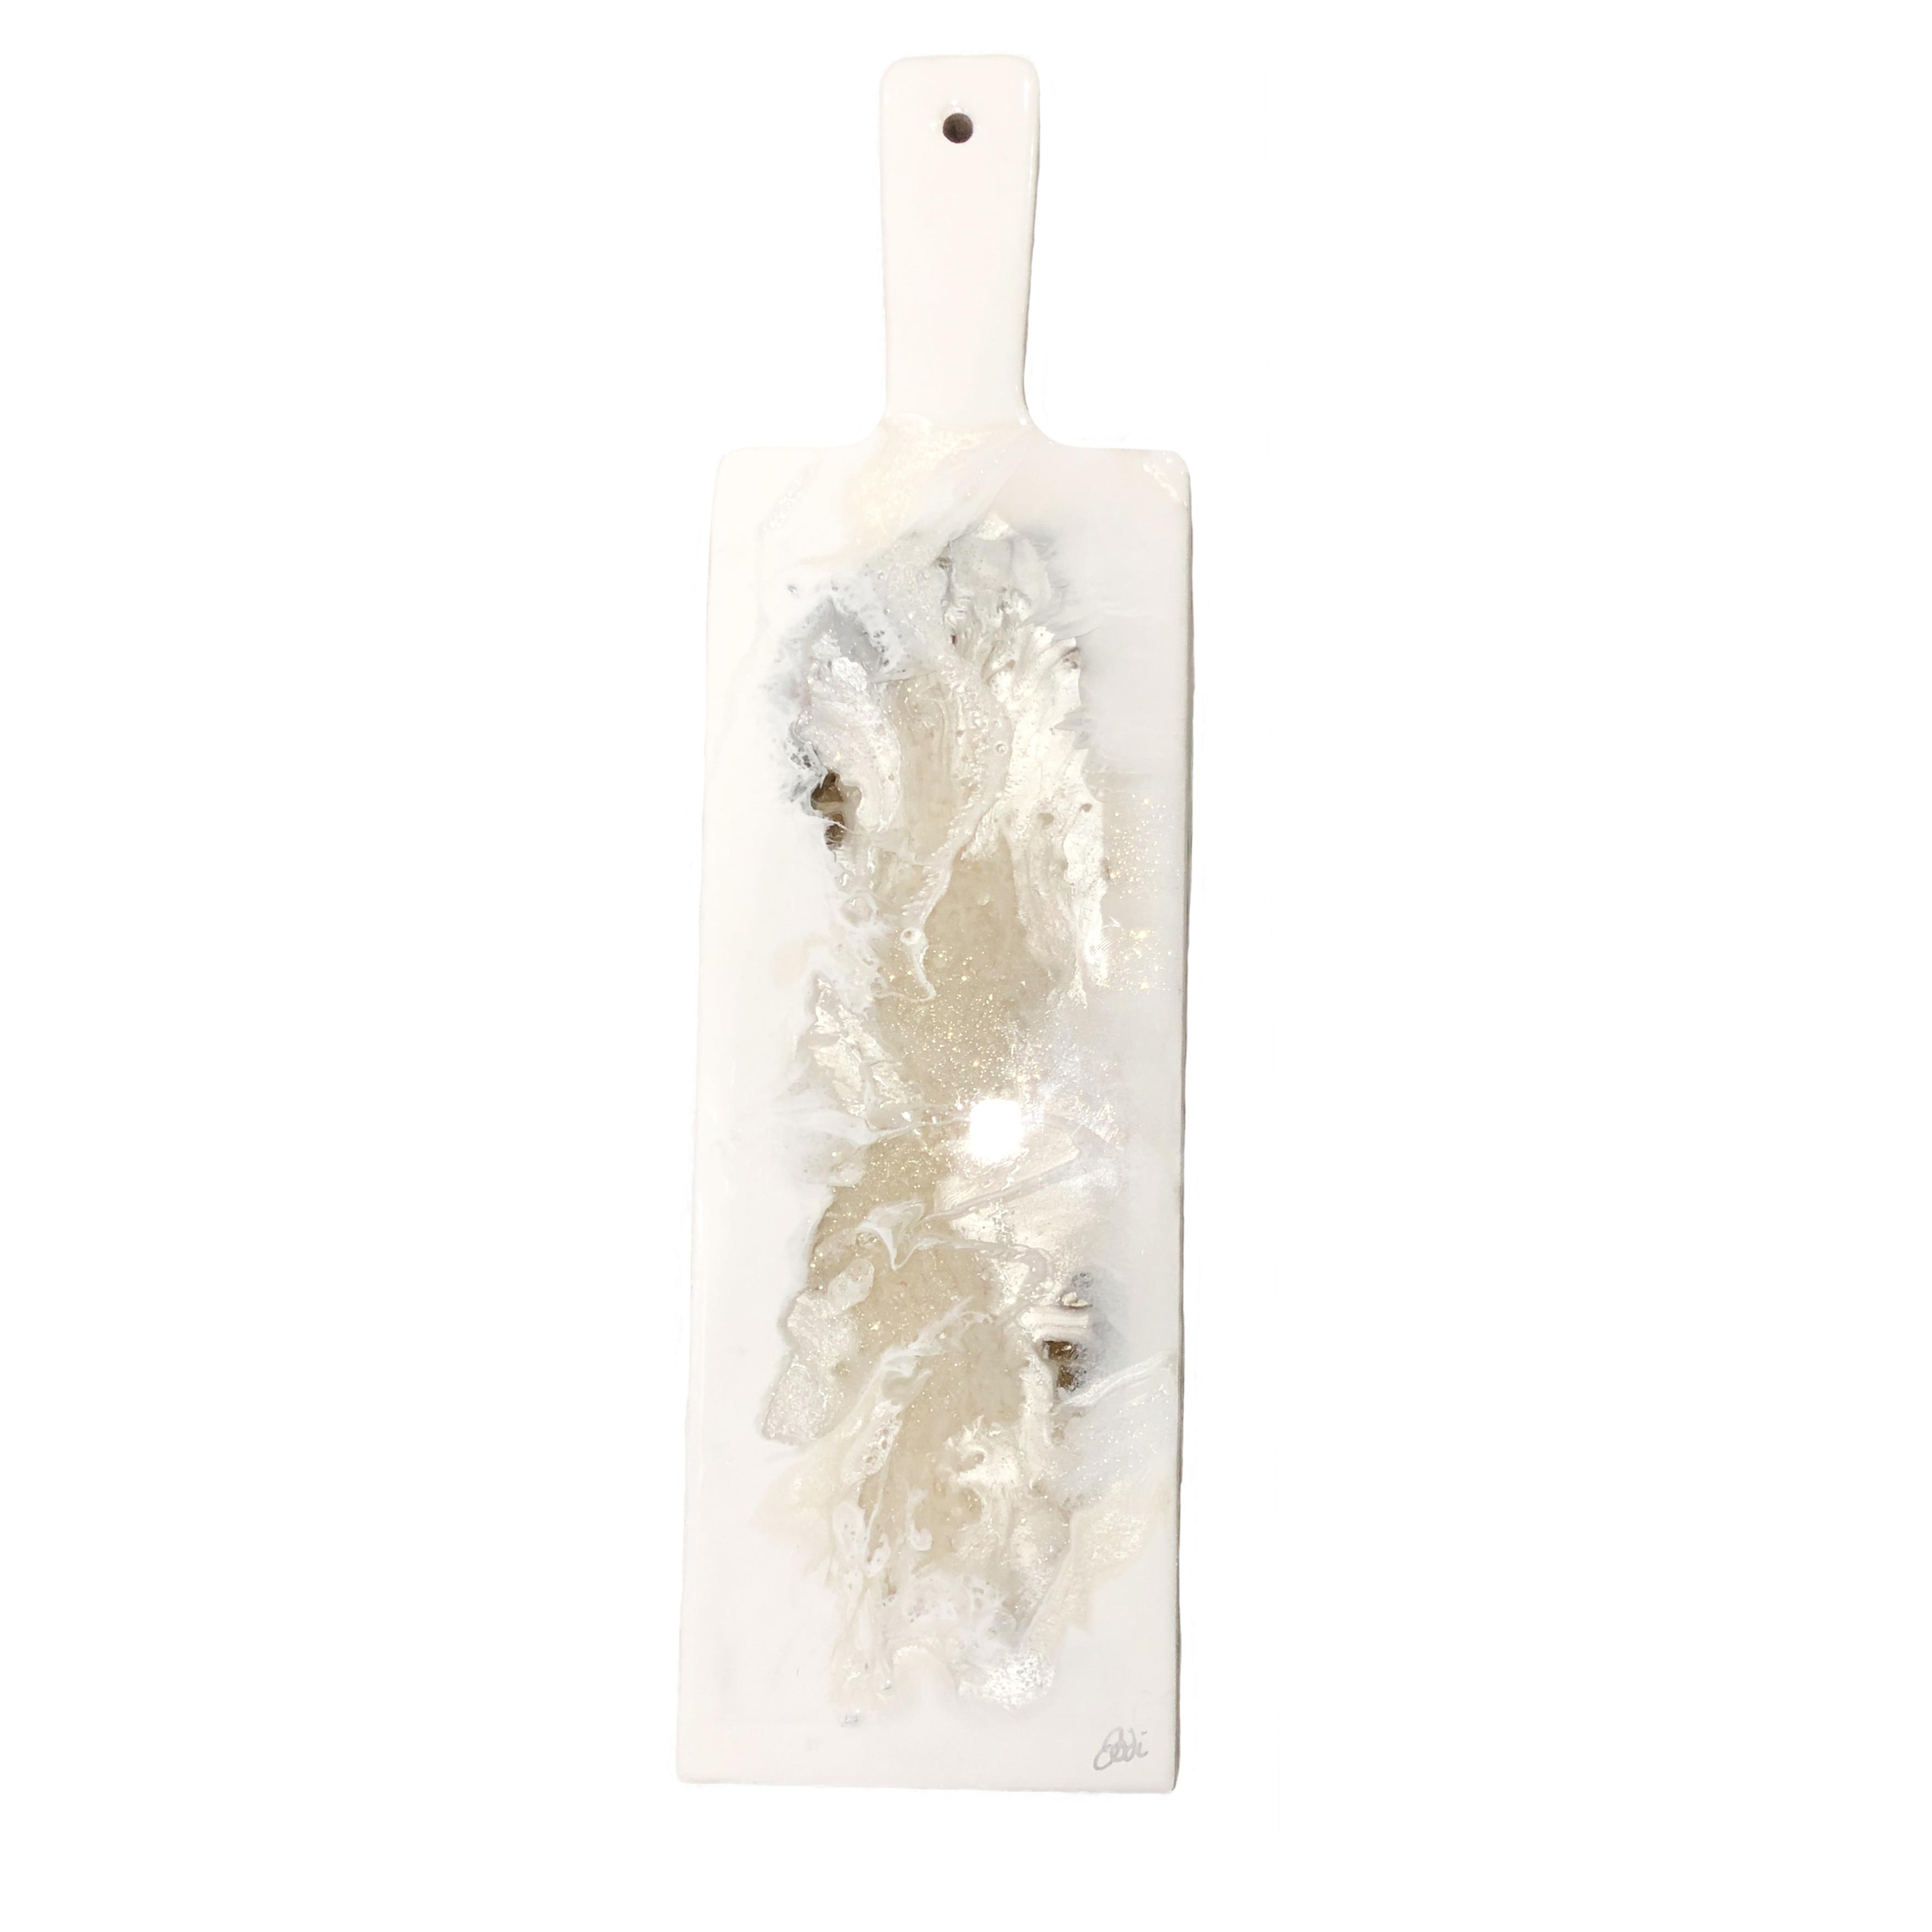 Bamboo Crystal